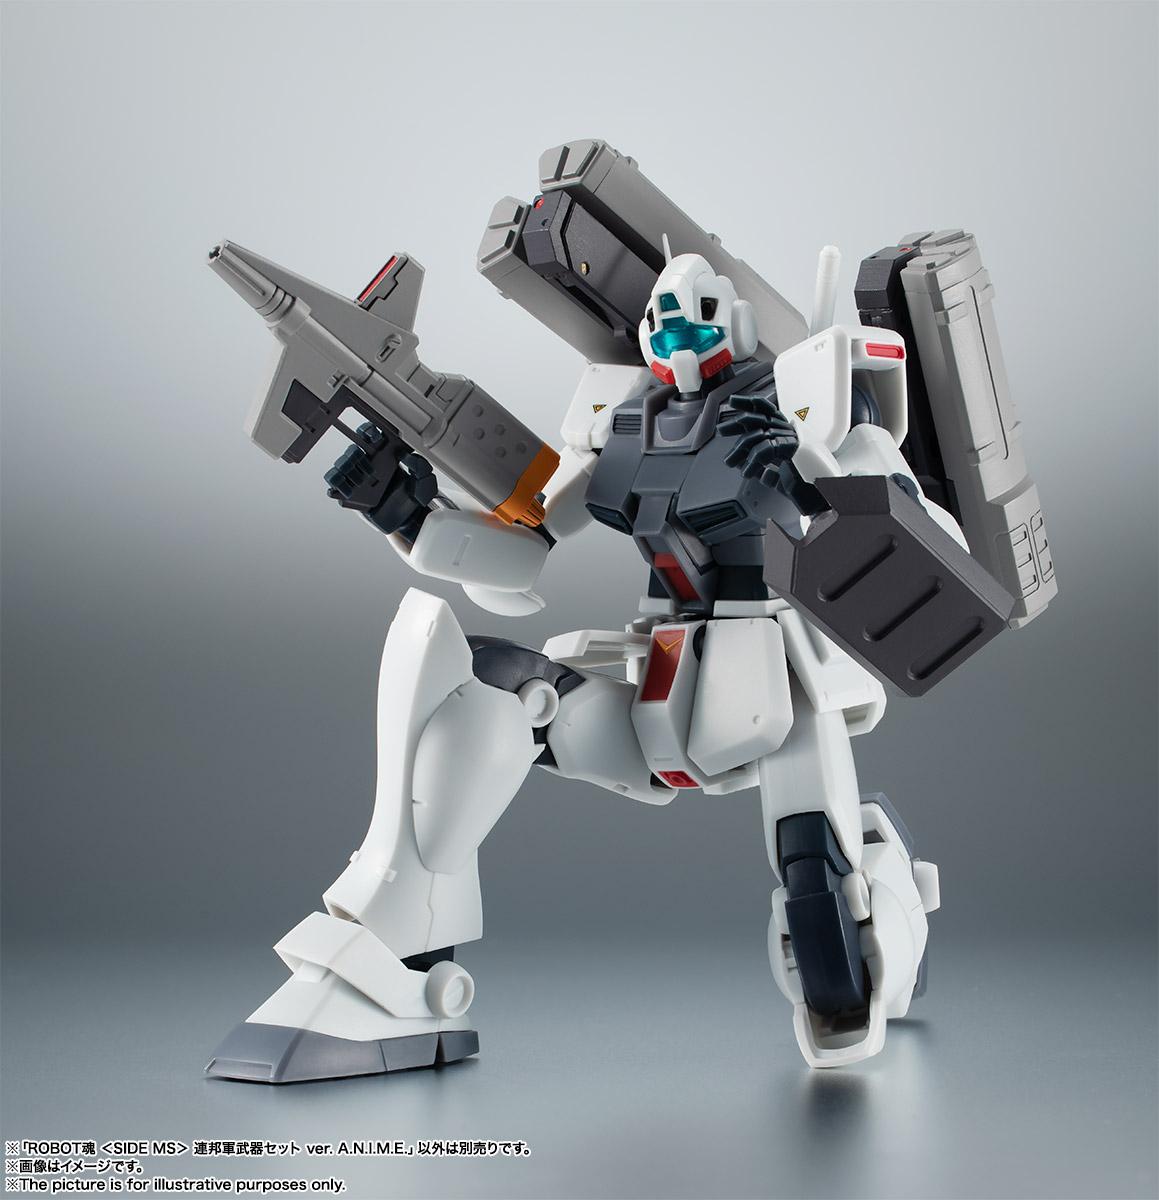 ROBOT魂〈SIDE MS〉『連邦軍武器セット ver. A.N.I.M.E.』ガンダム 完成品フィギュア-012